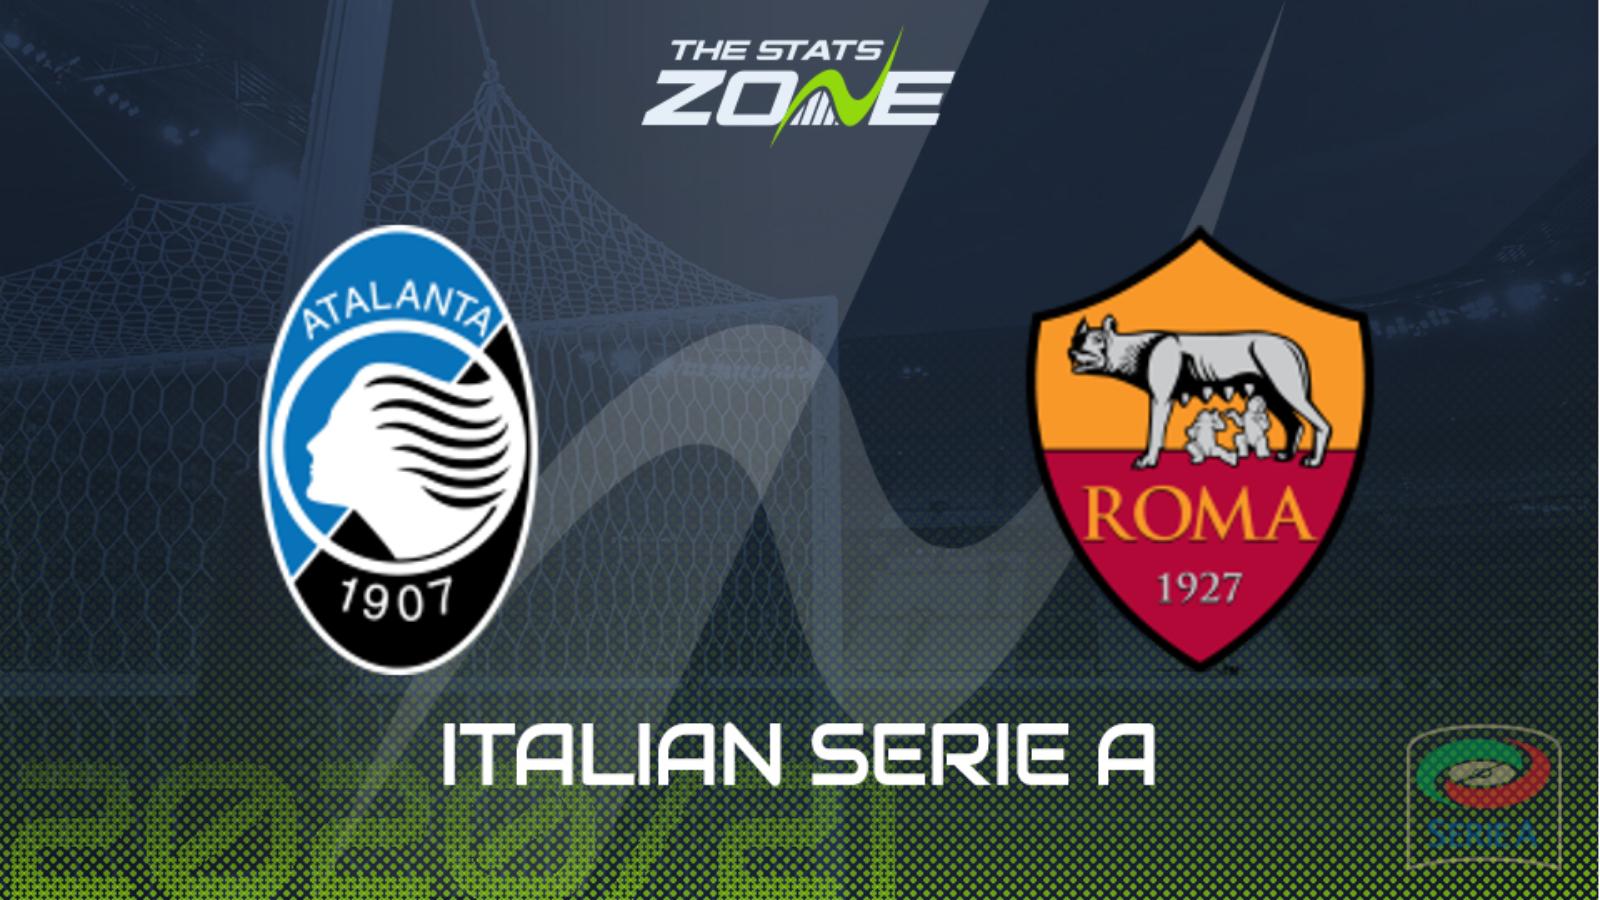 Roma atalanta betting previews rams seahawks betting line